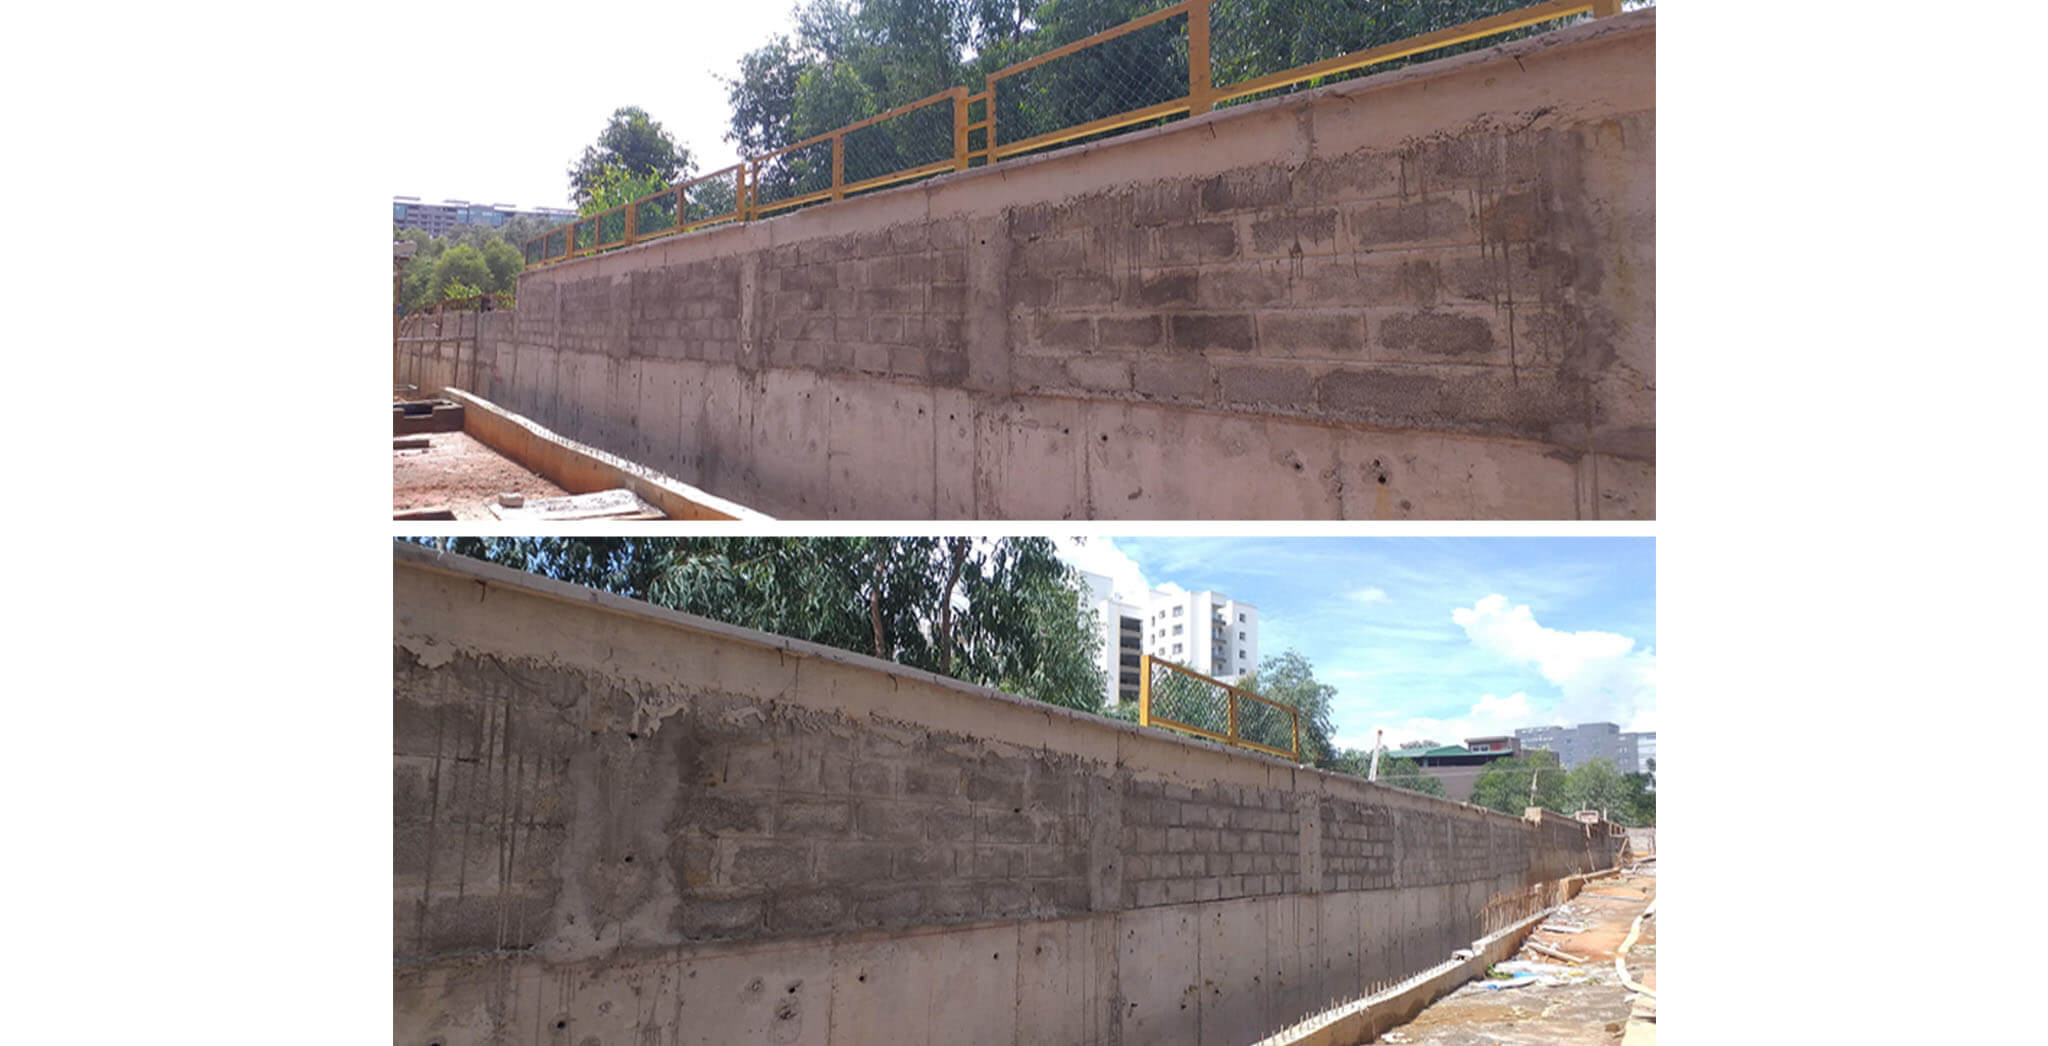 Jun 2021 - North side compound wall